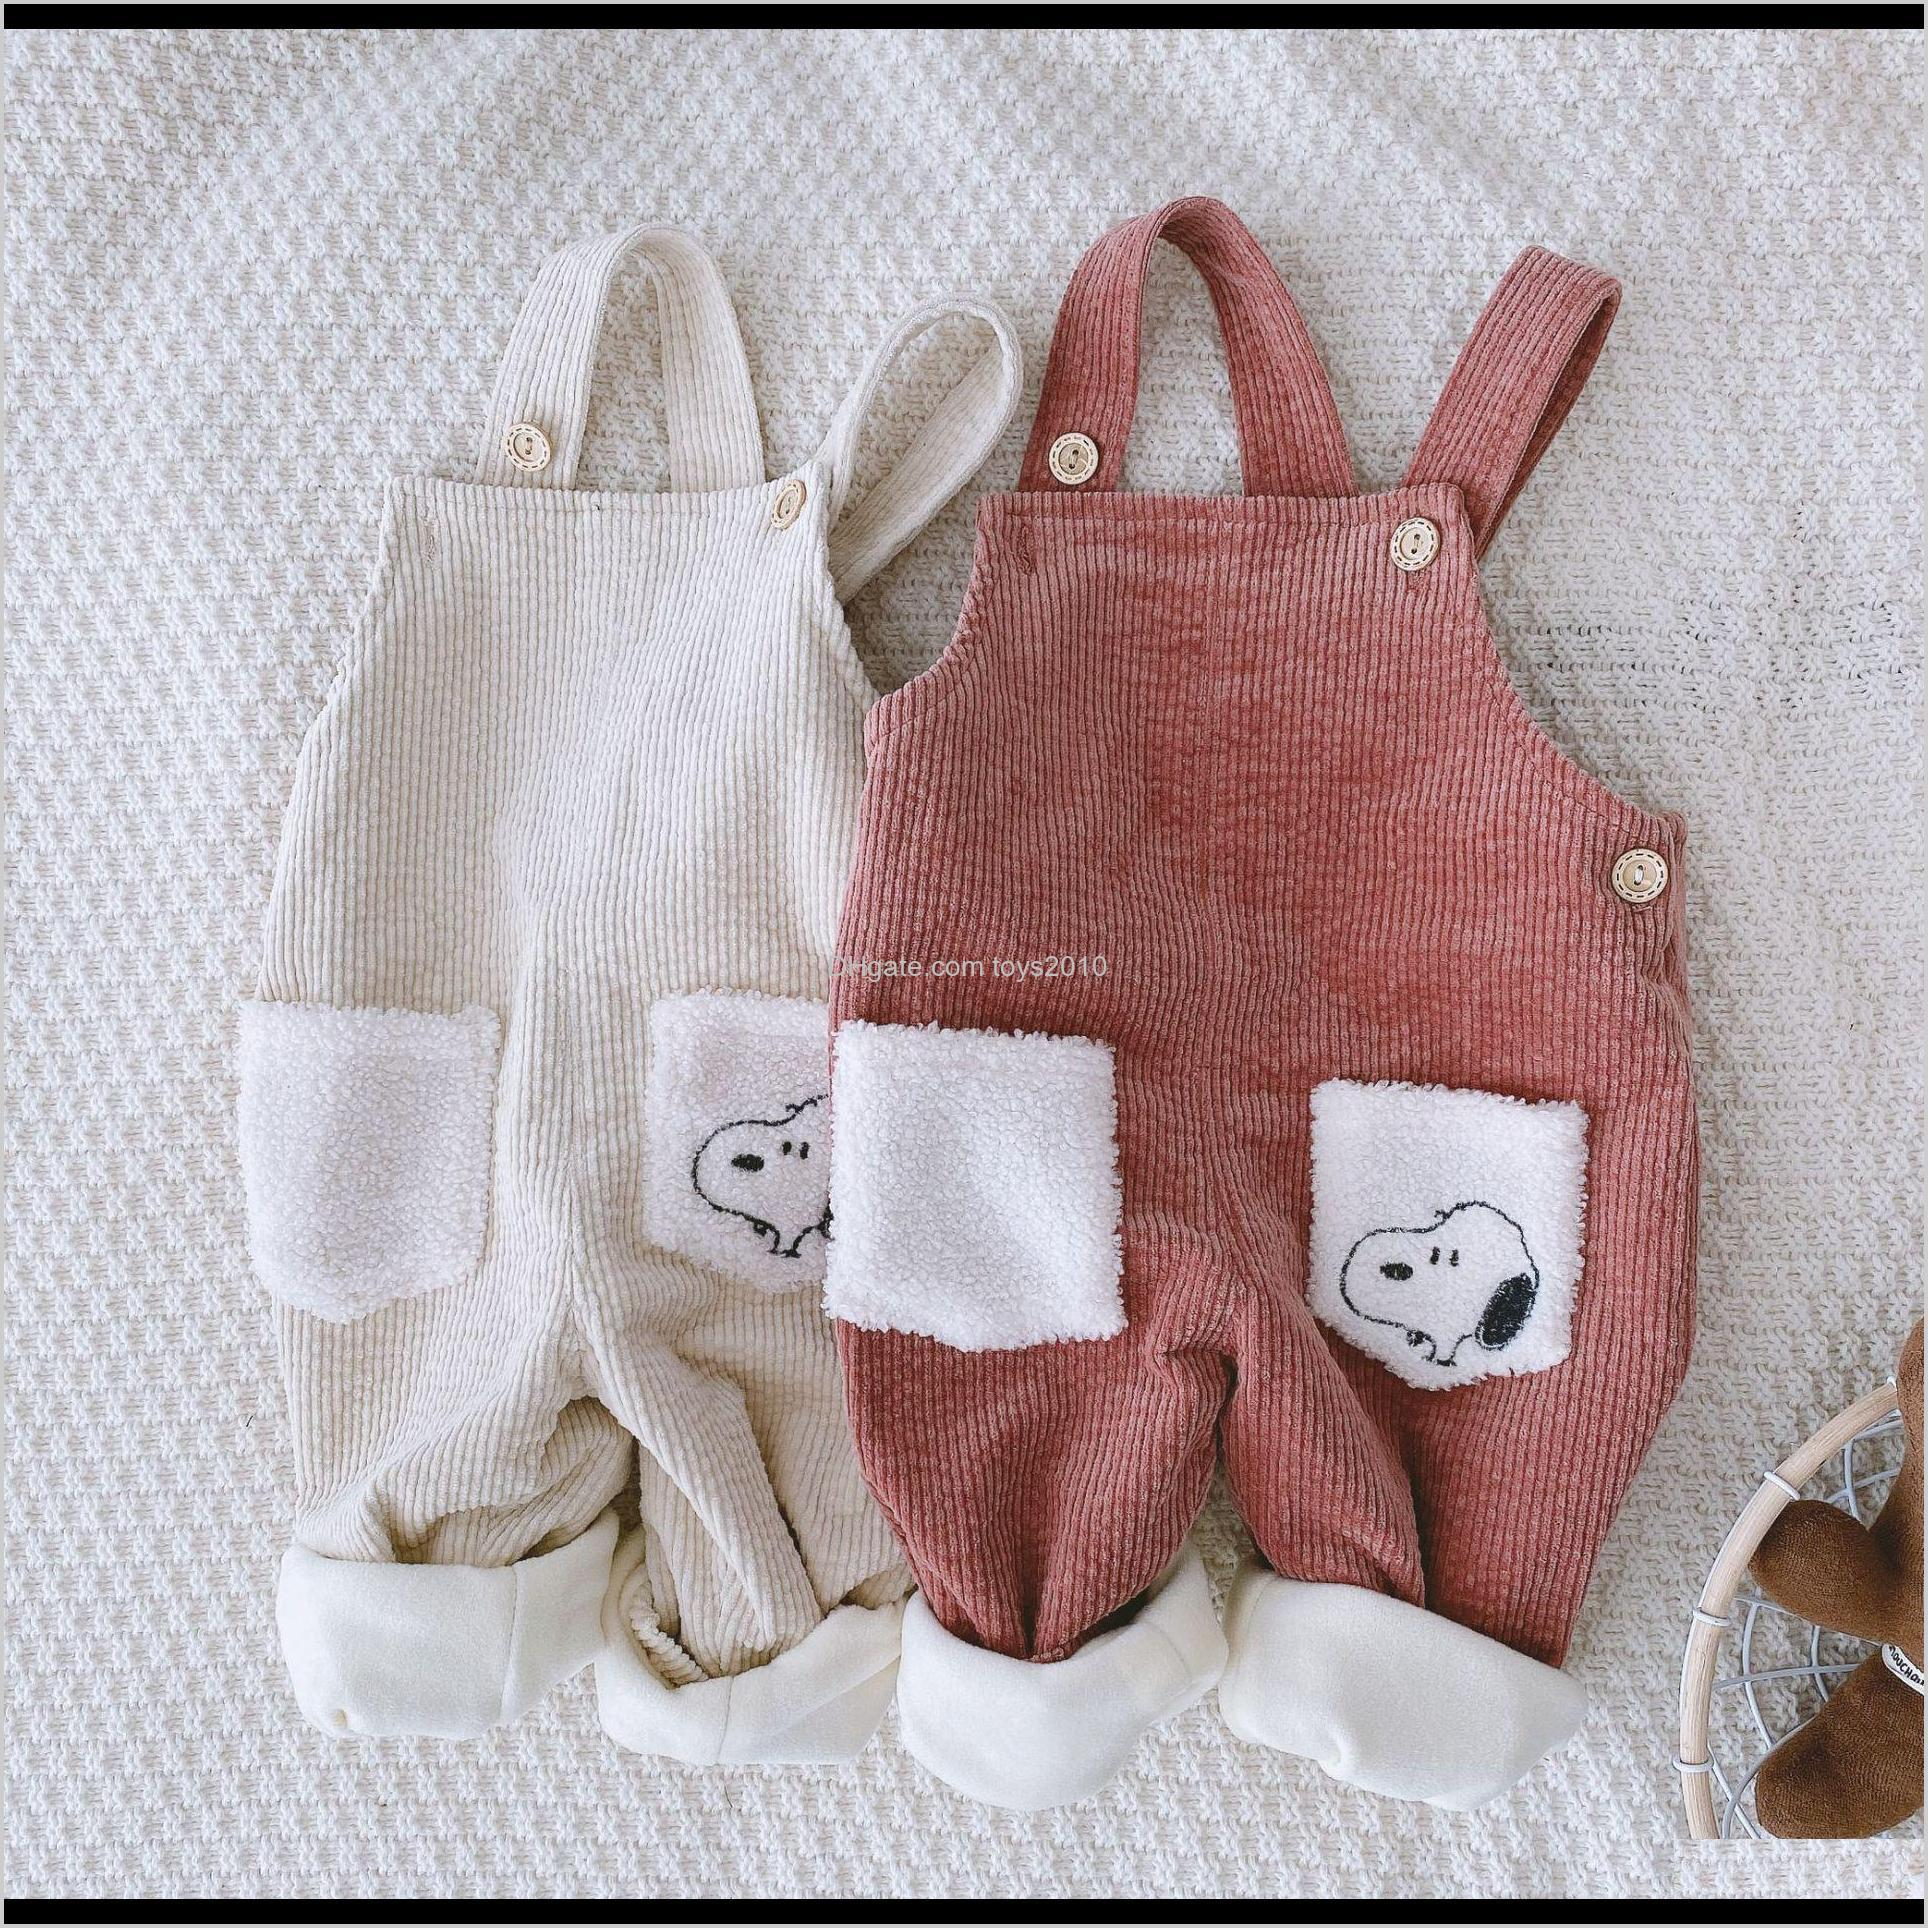 Overalls Baby, & Maternity Drop Delivery 2021 Baby Corduroy Suspender Pants Plus Fleece Winter Kids Boutique Clothing Korean 1-4T Little Boys